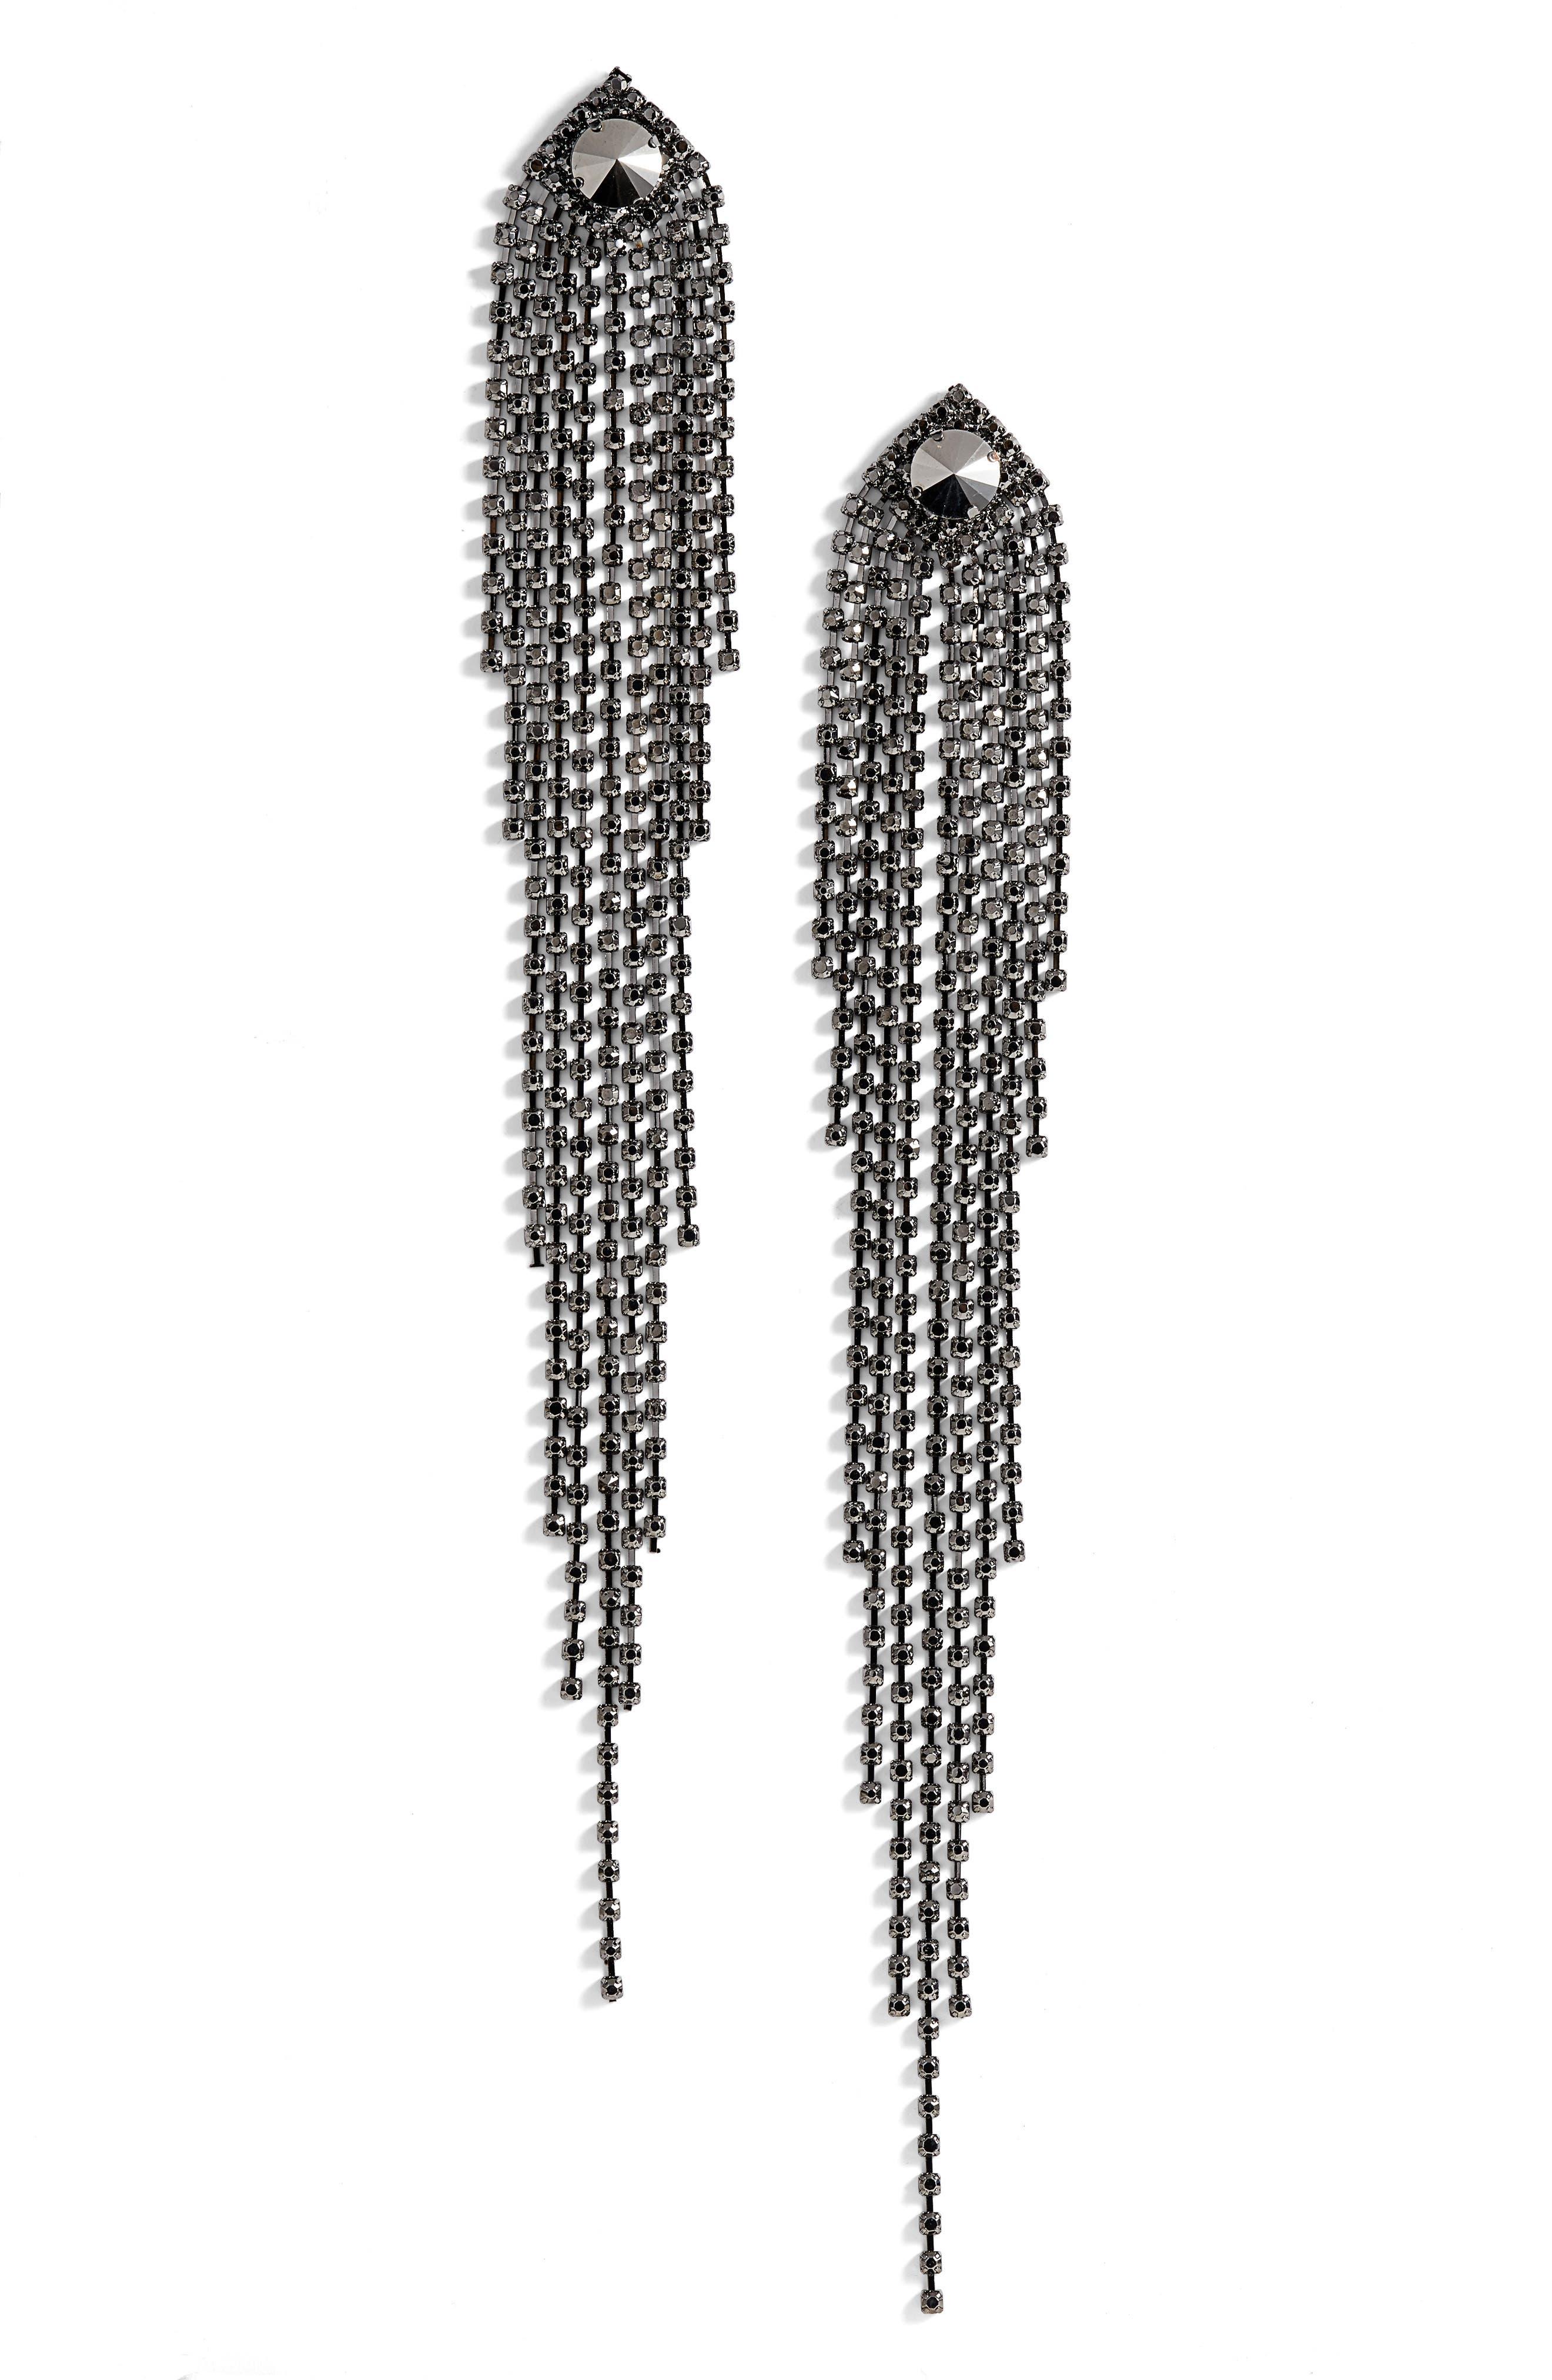 Drama Crystal Shoulder Duster Earrings,                             Main thumbnail 1, color,                             040